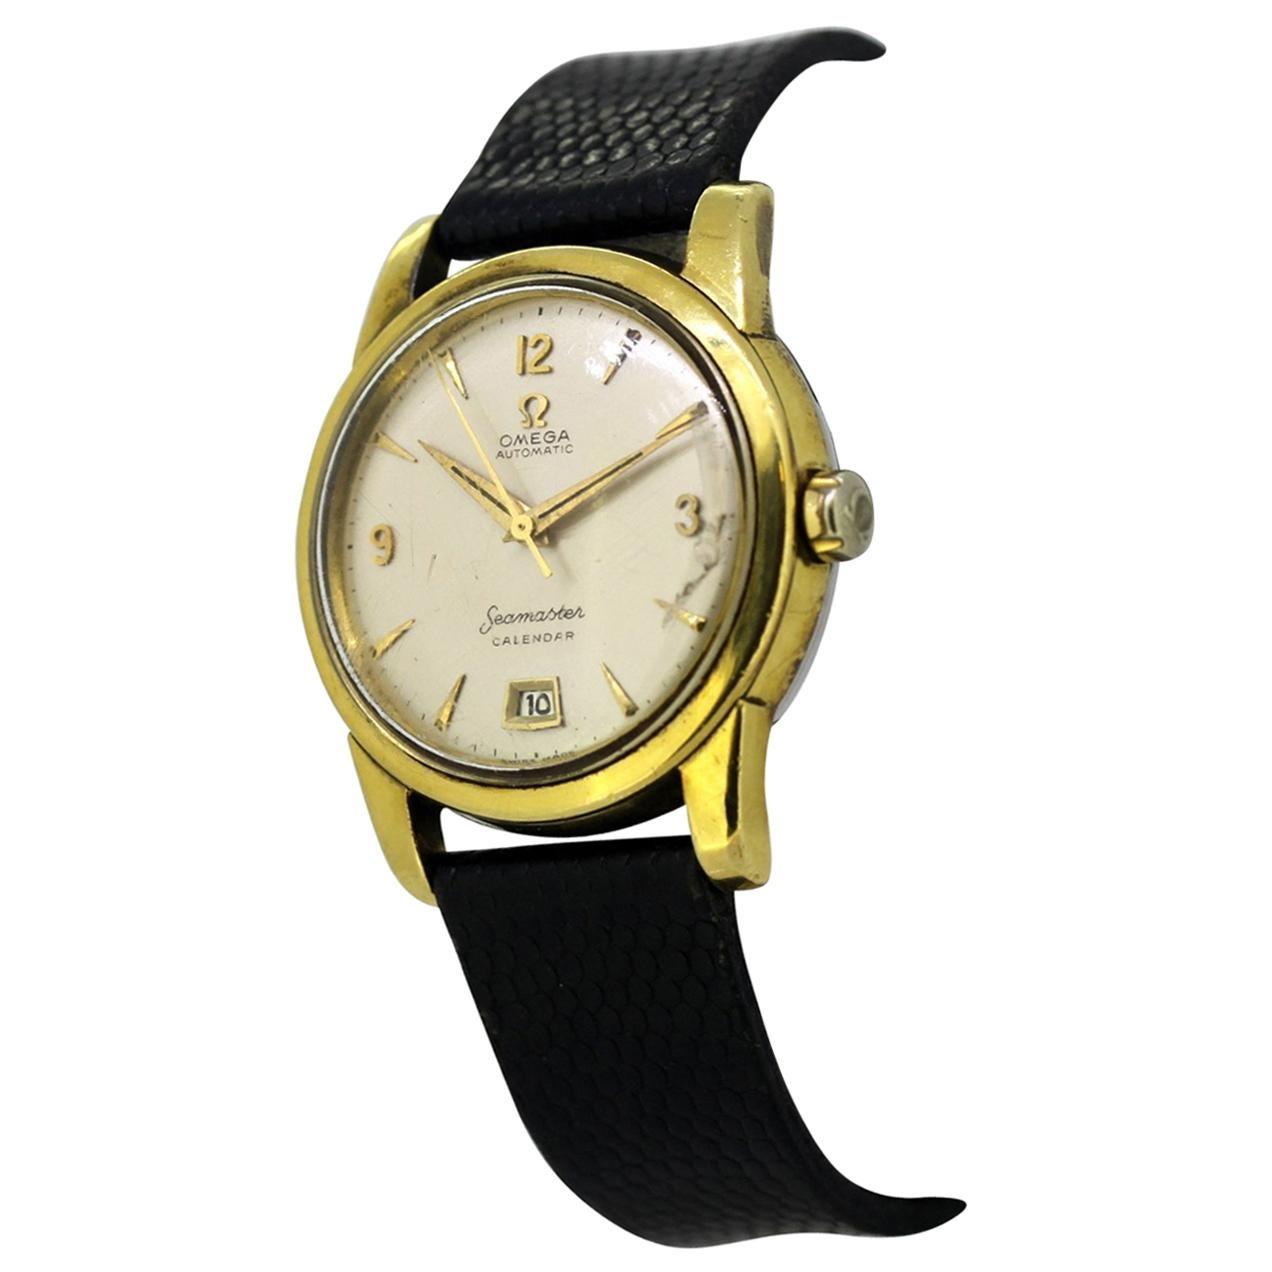 Vintage Omega Seamaster Calendar Automatic Men's Wristwatch, circa 1960s